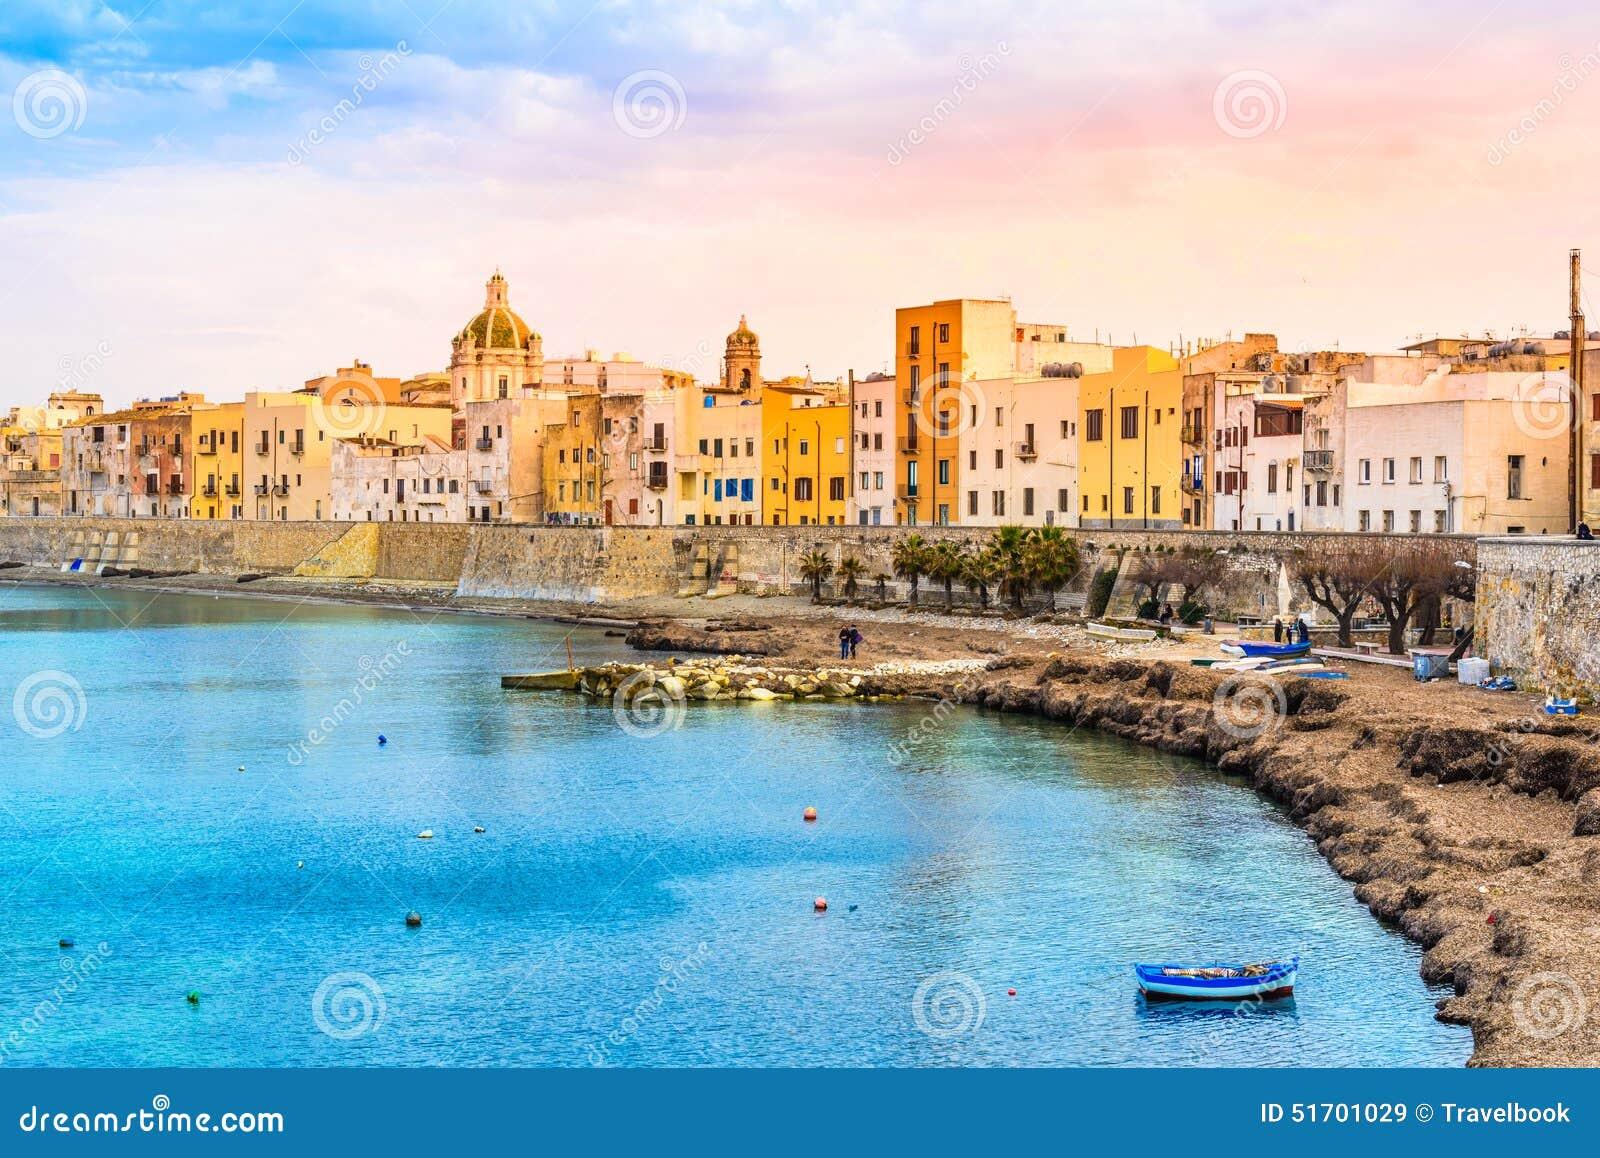 Trapani Panoramic View Sicily Italy Stock Photo Image